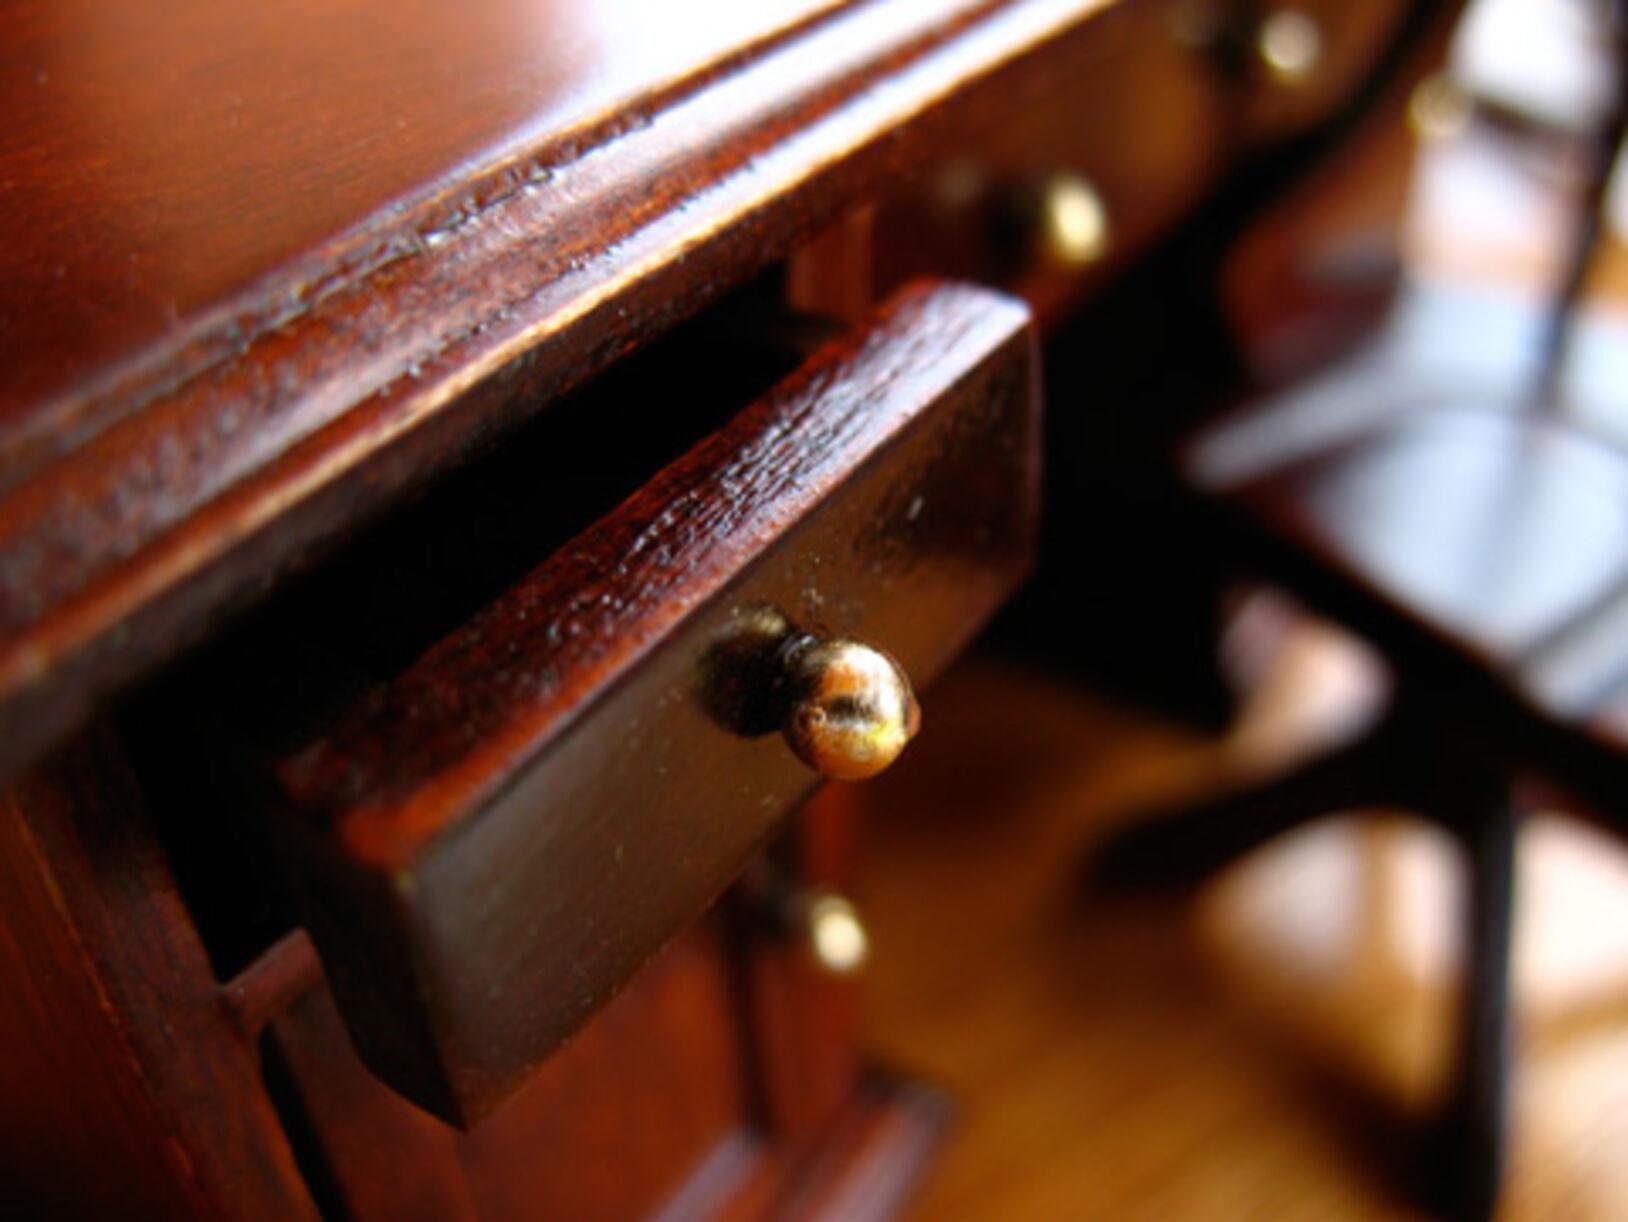 De meubelmaker